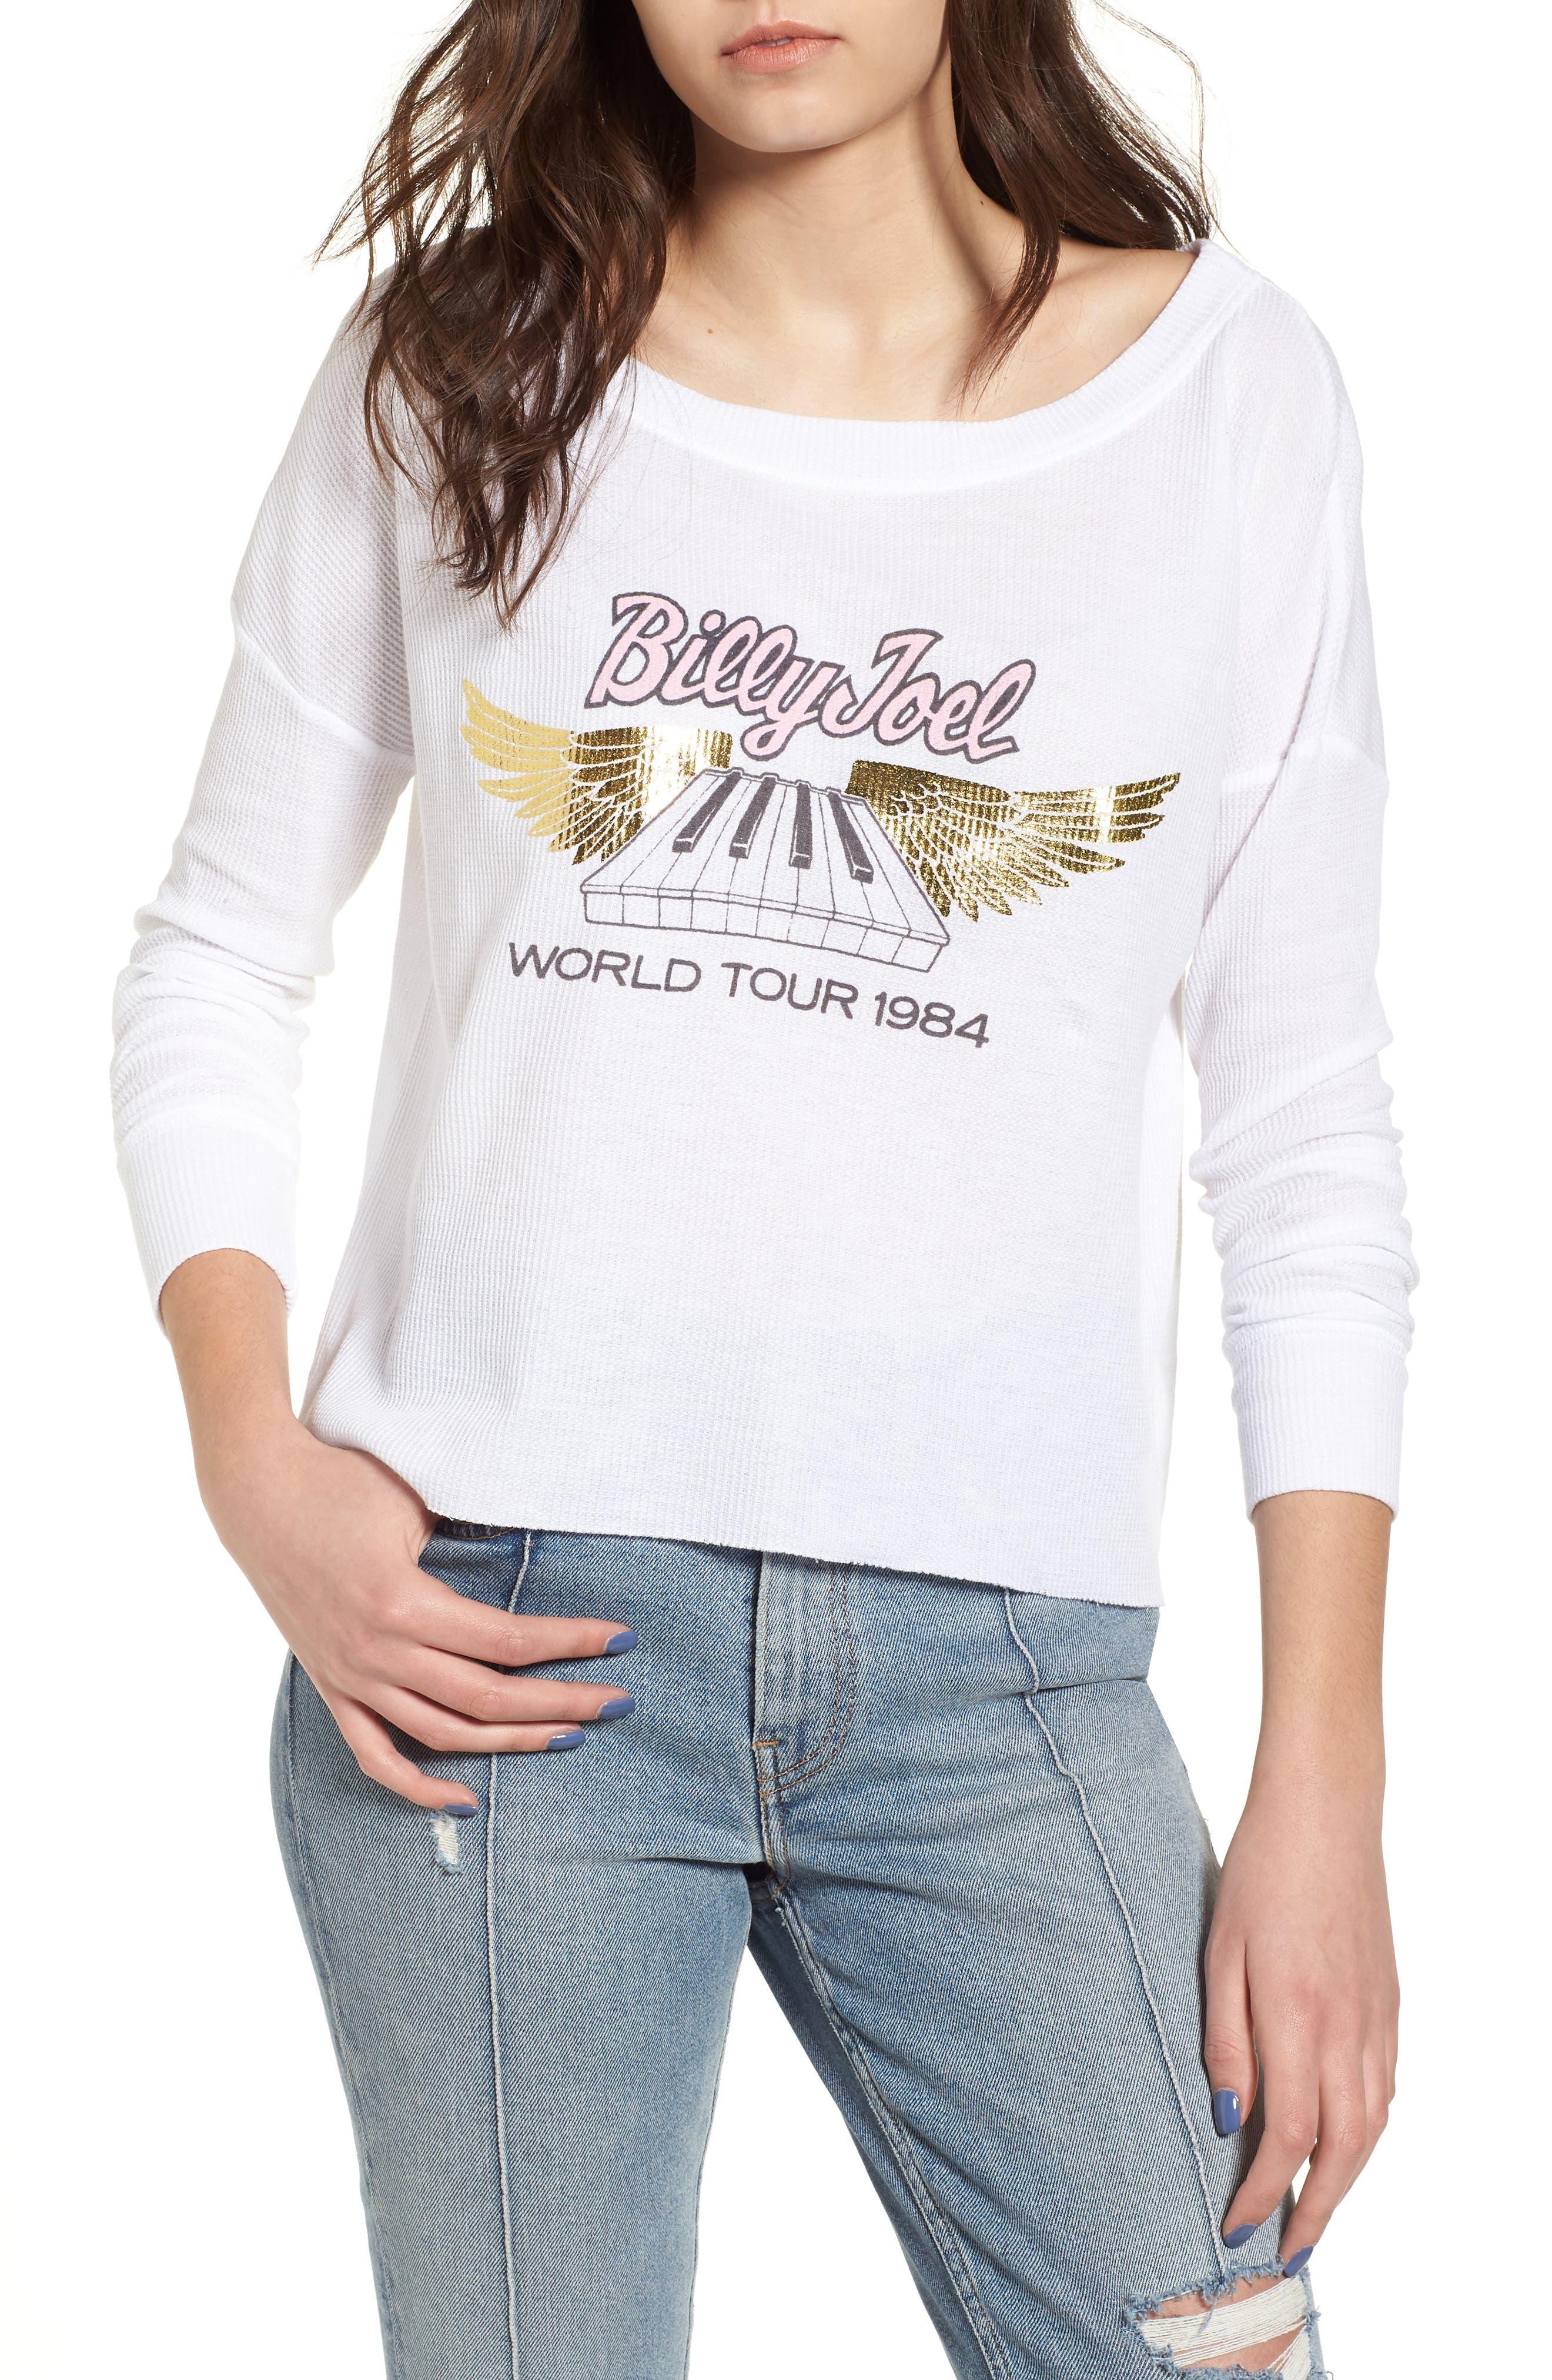 Billy Joel Thermal Top,                         Main,                         color, Vintage White